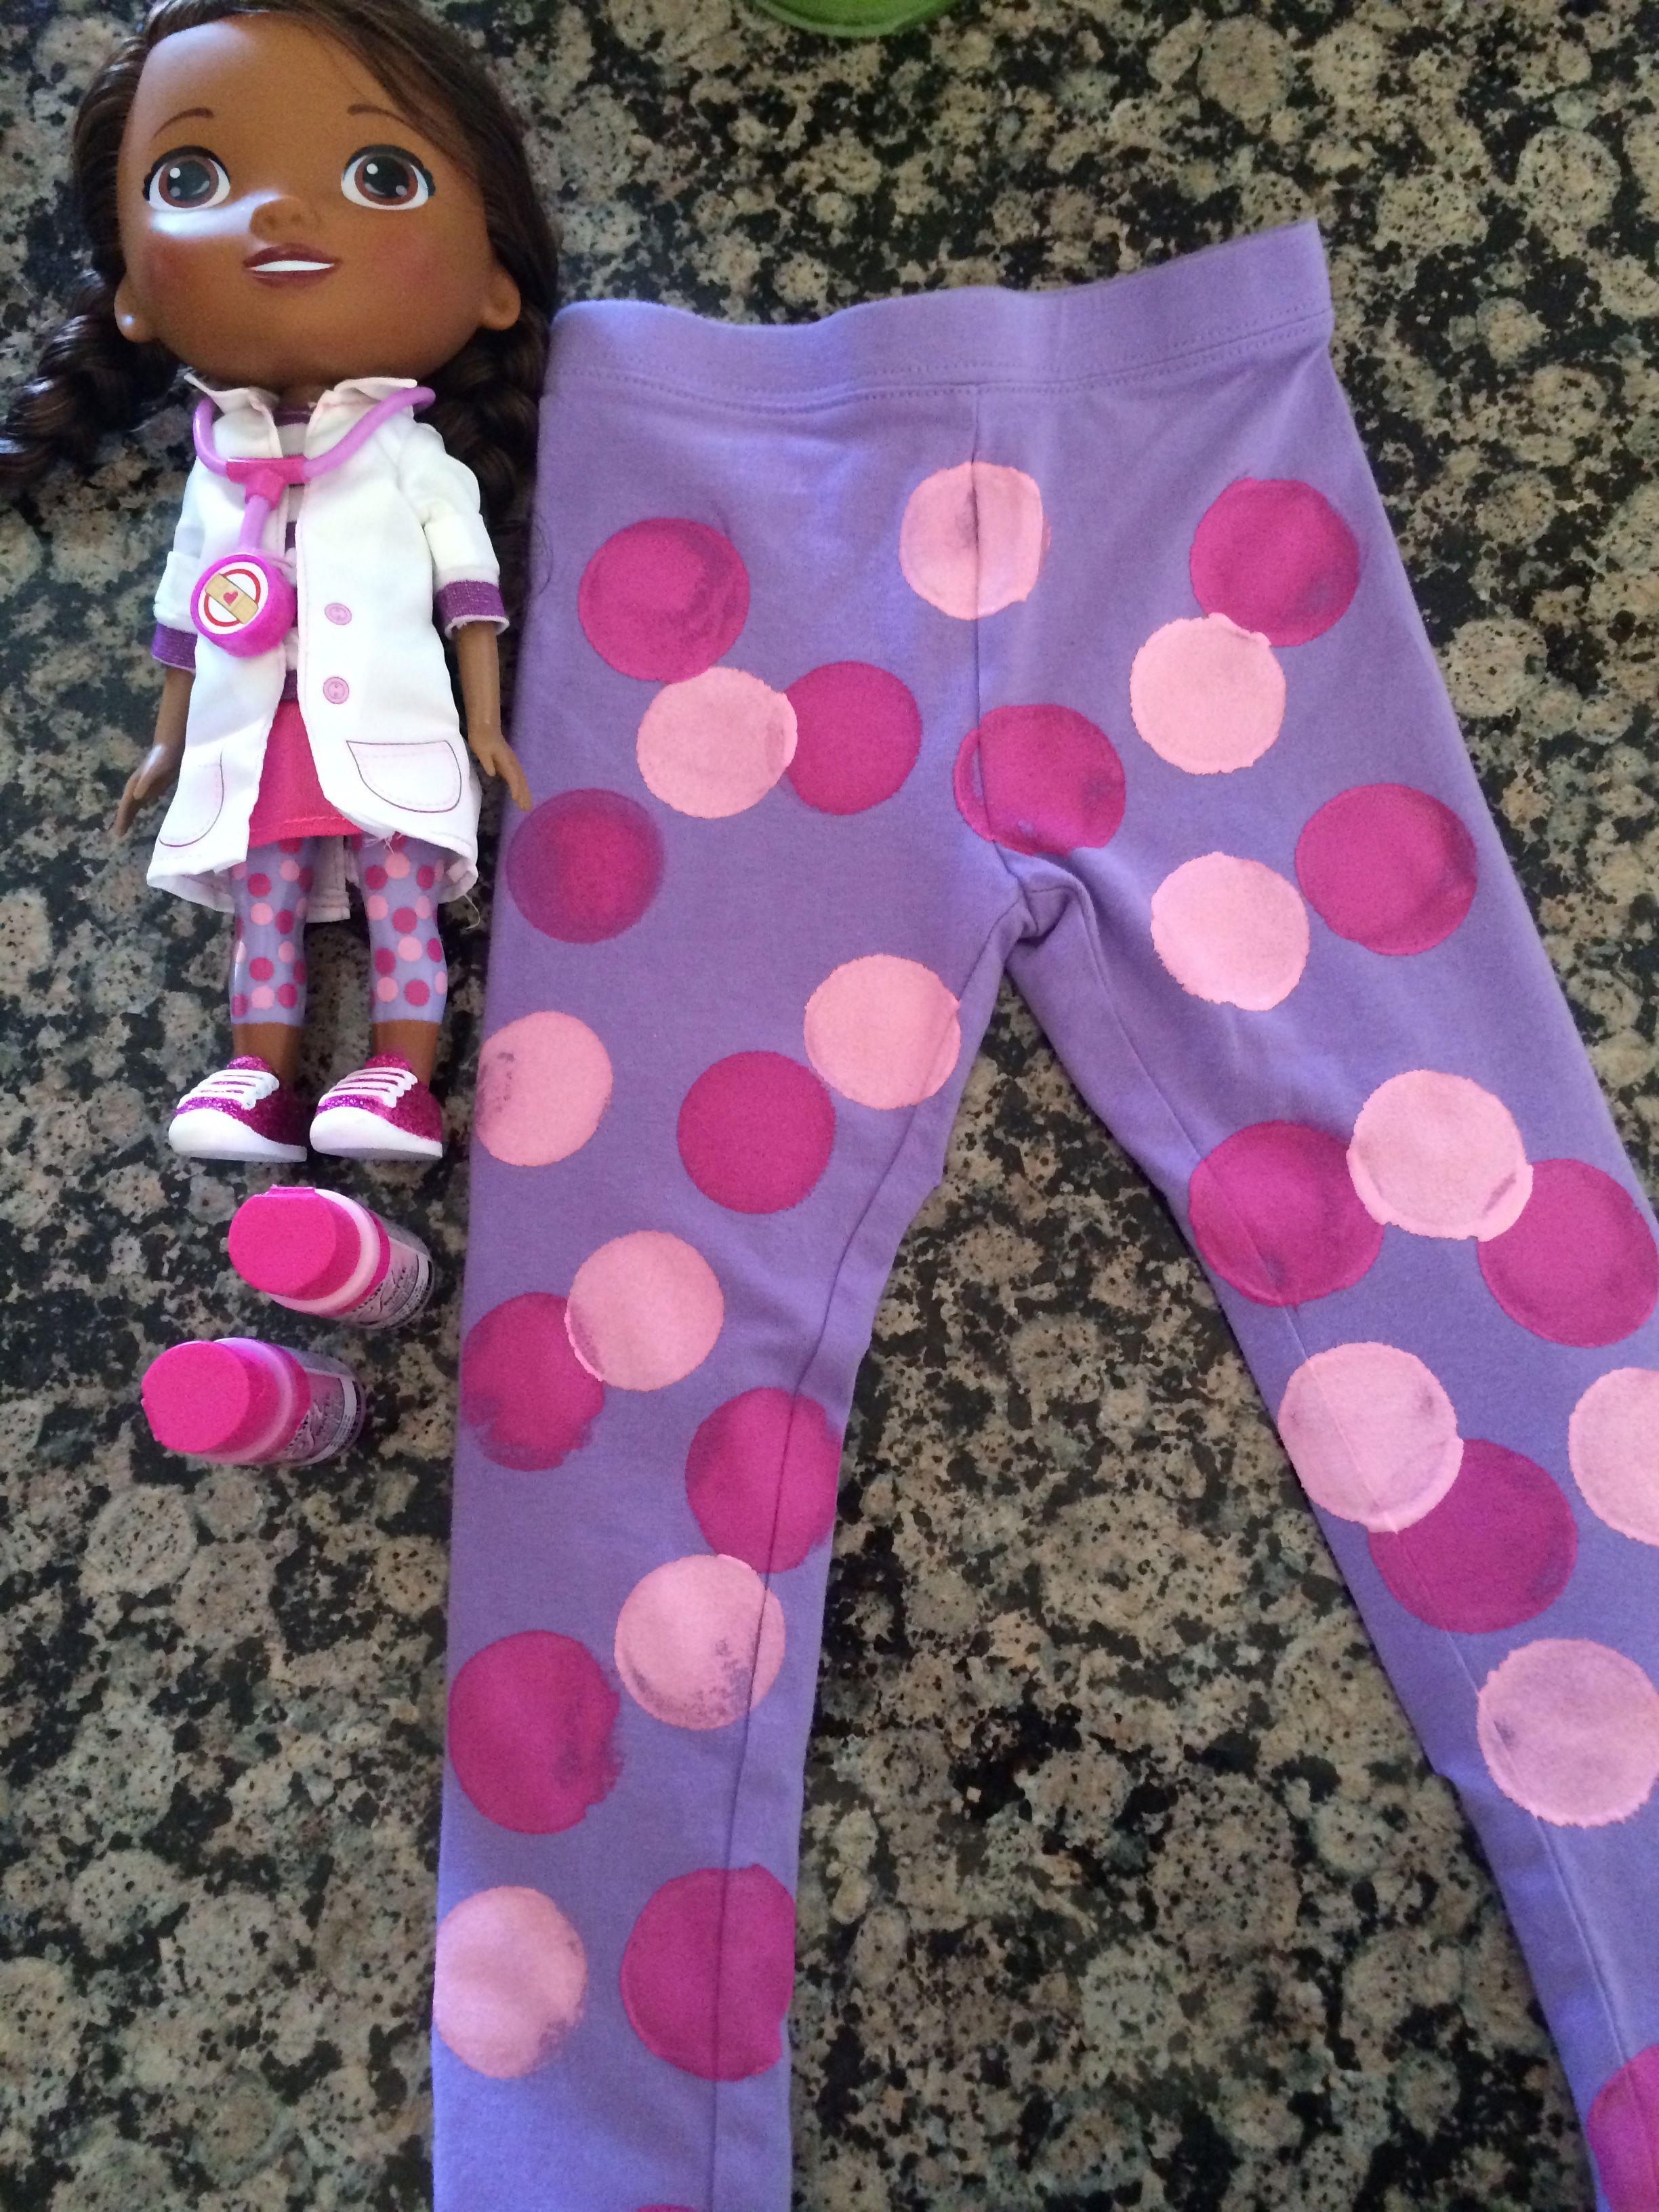 painted polka dot Doc leggings | Addy CoolStuff | Doc ...